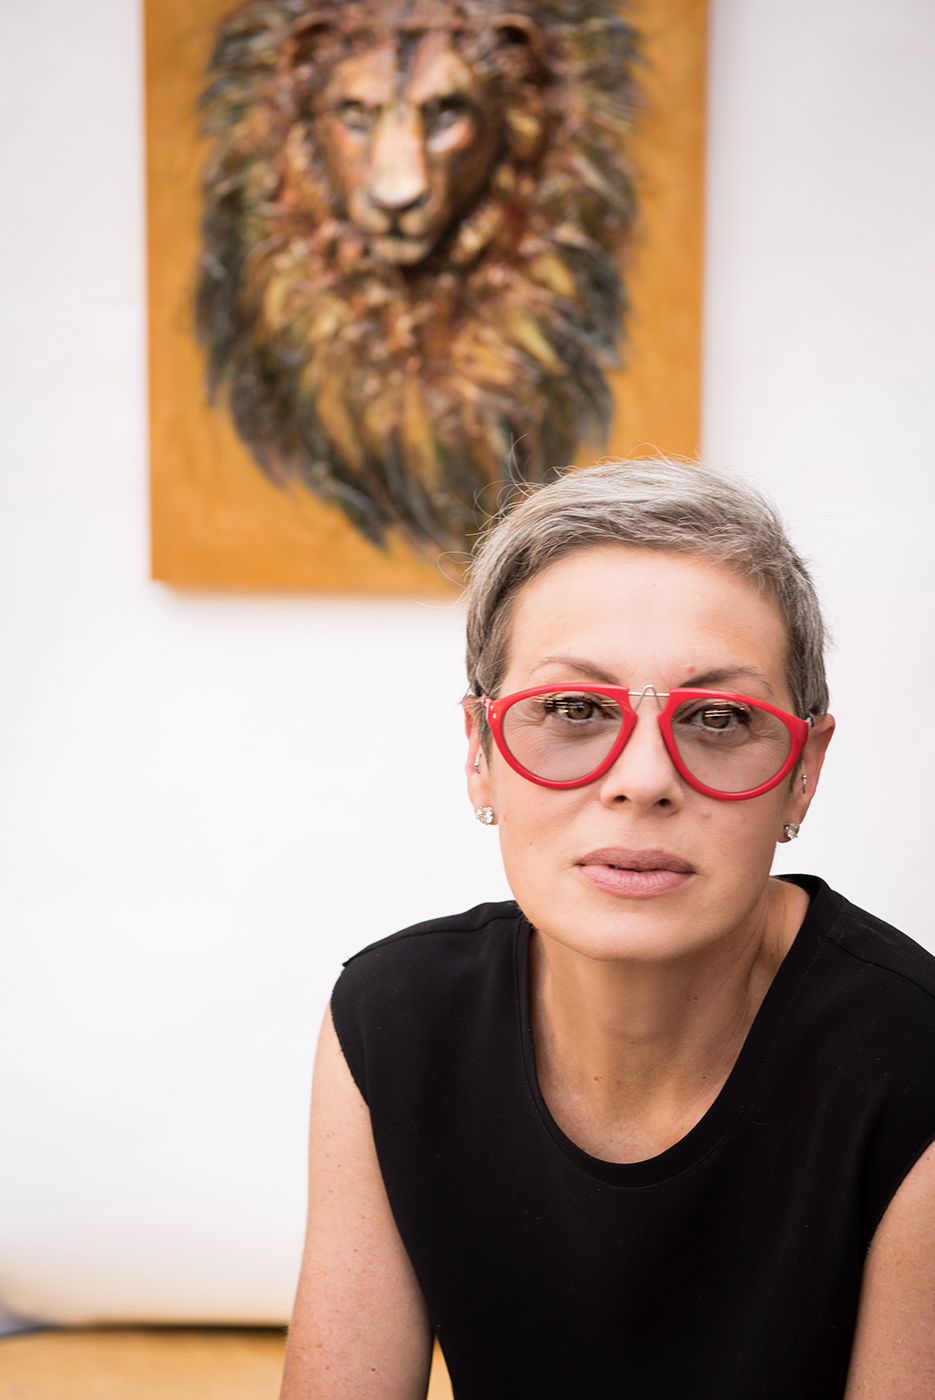 Cathleen Klibanoff